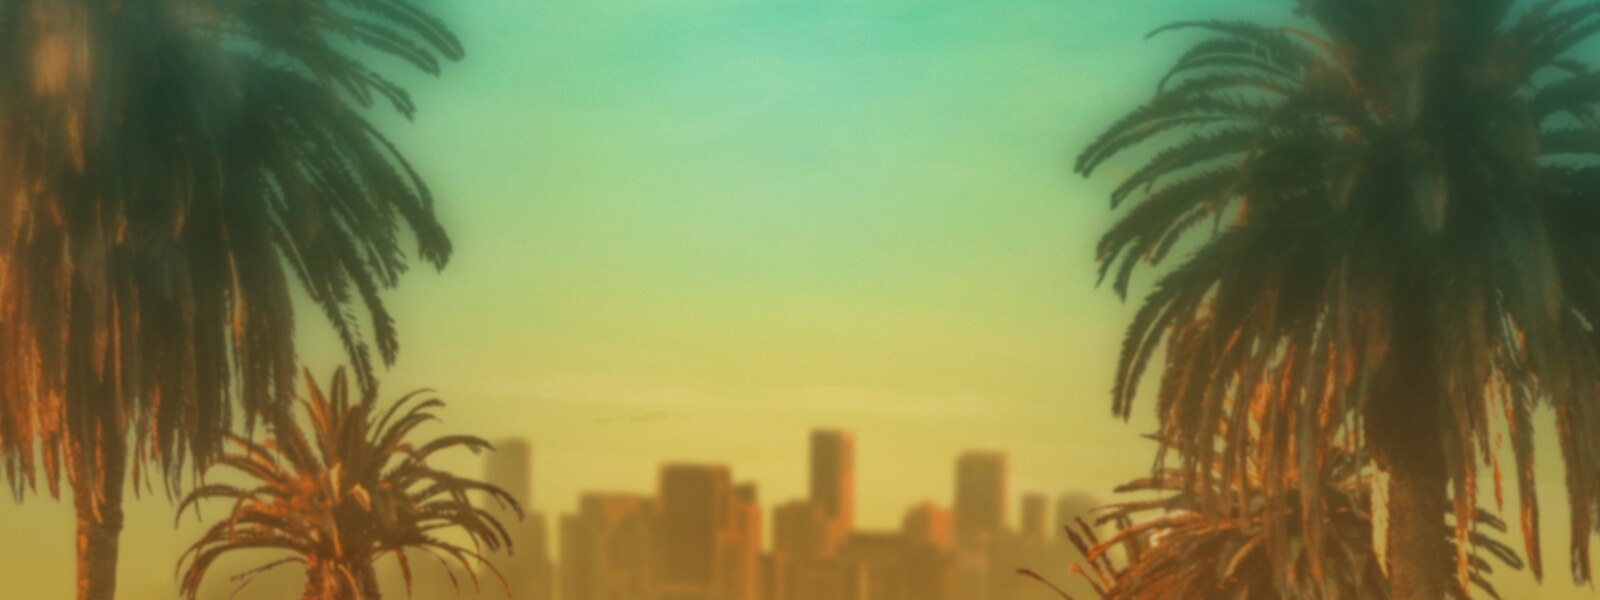 Background show artwork for Mogul